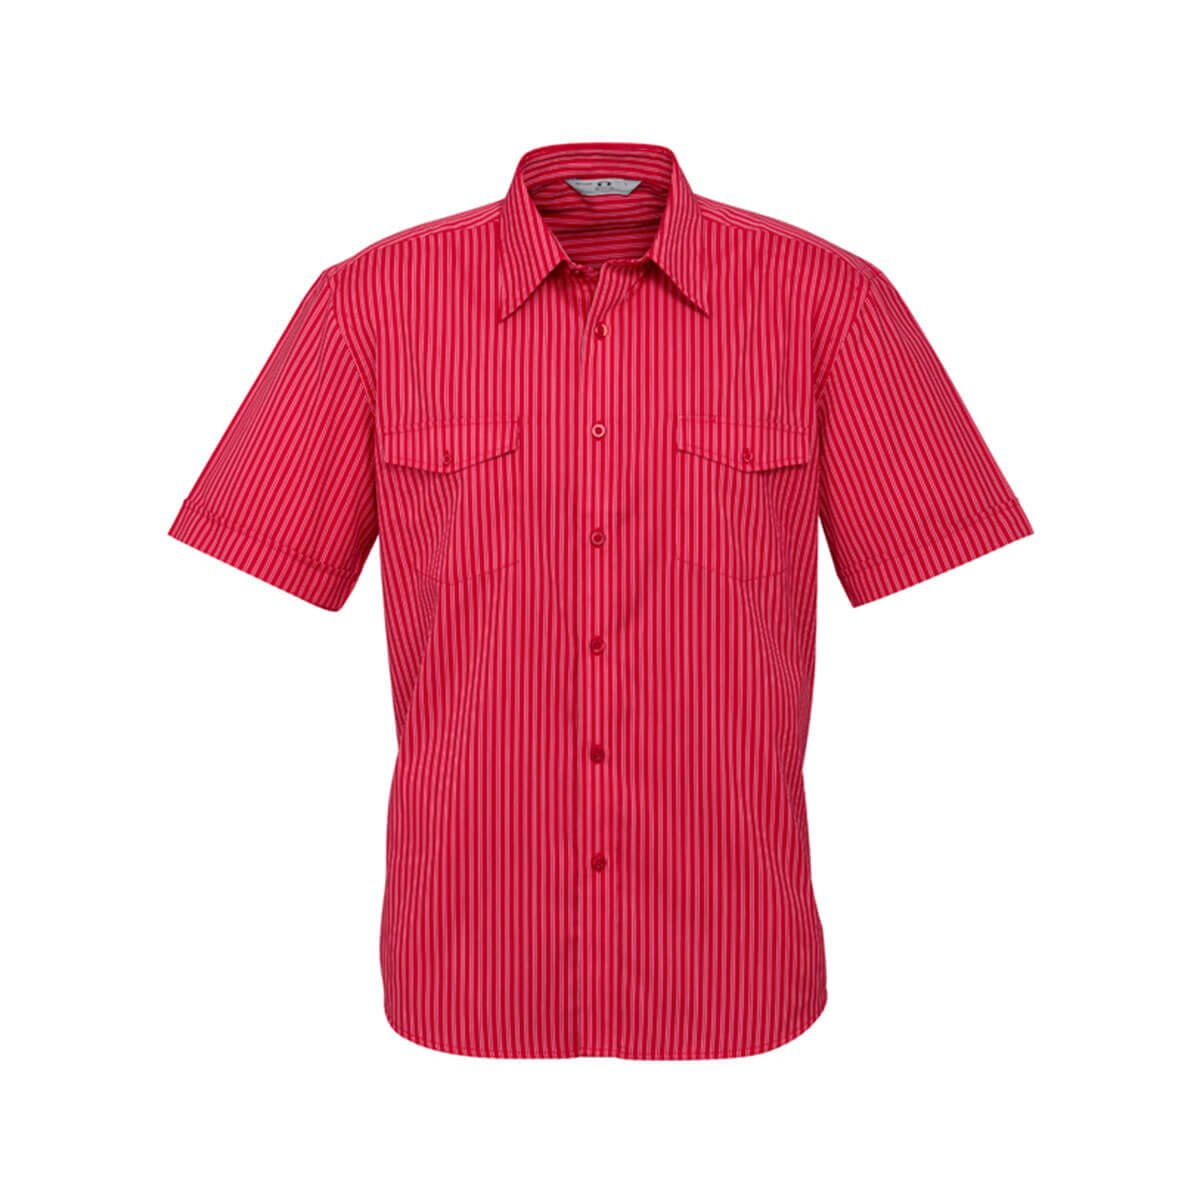 Mens Cuban Short Sleeve Shirt-Red / Silver